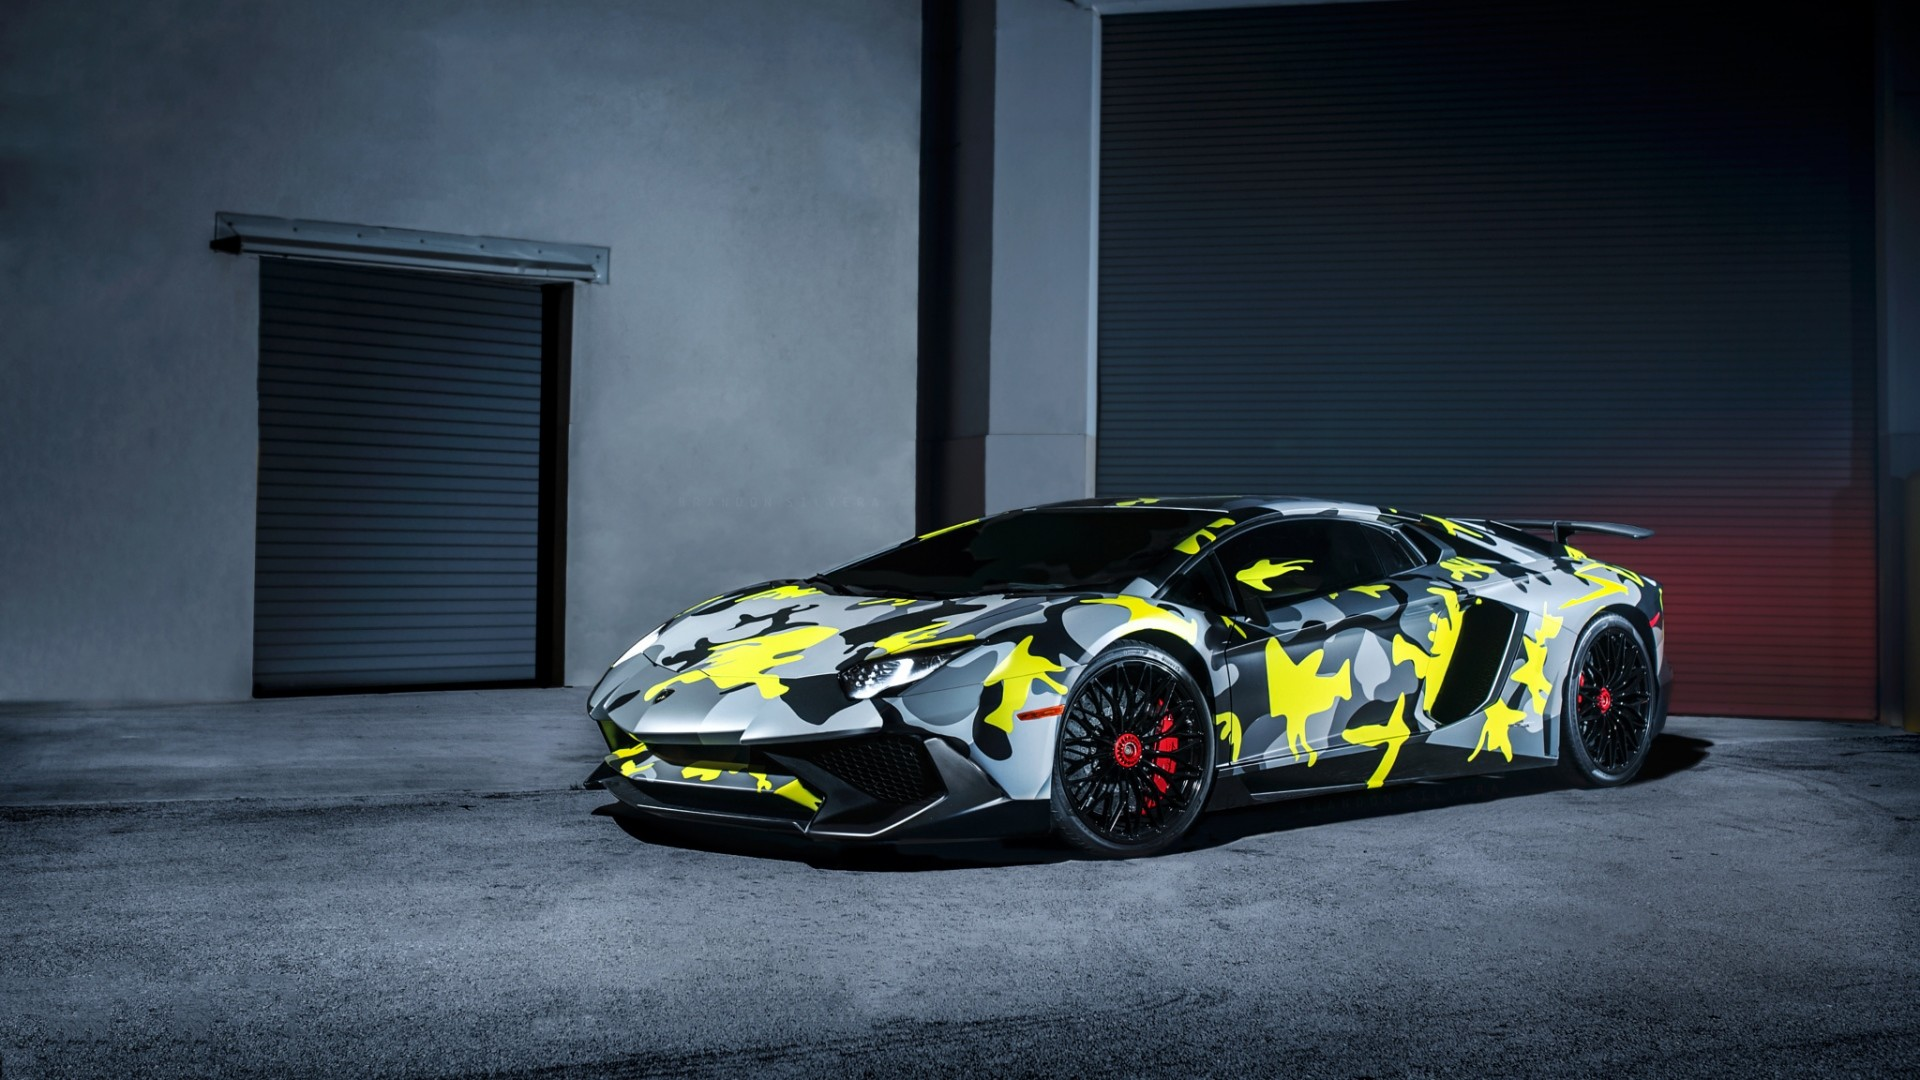 Hd Wallpapers Lamborghini Egoista Concept Wallpaper Sweet Love